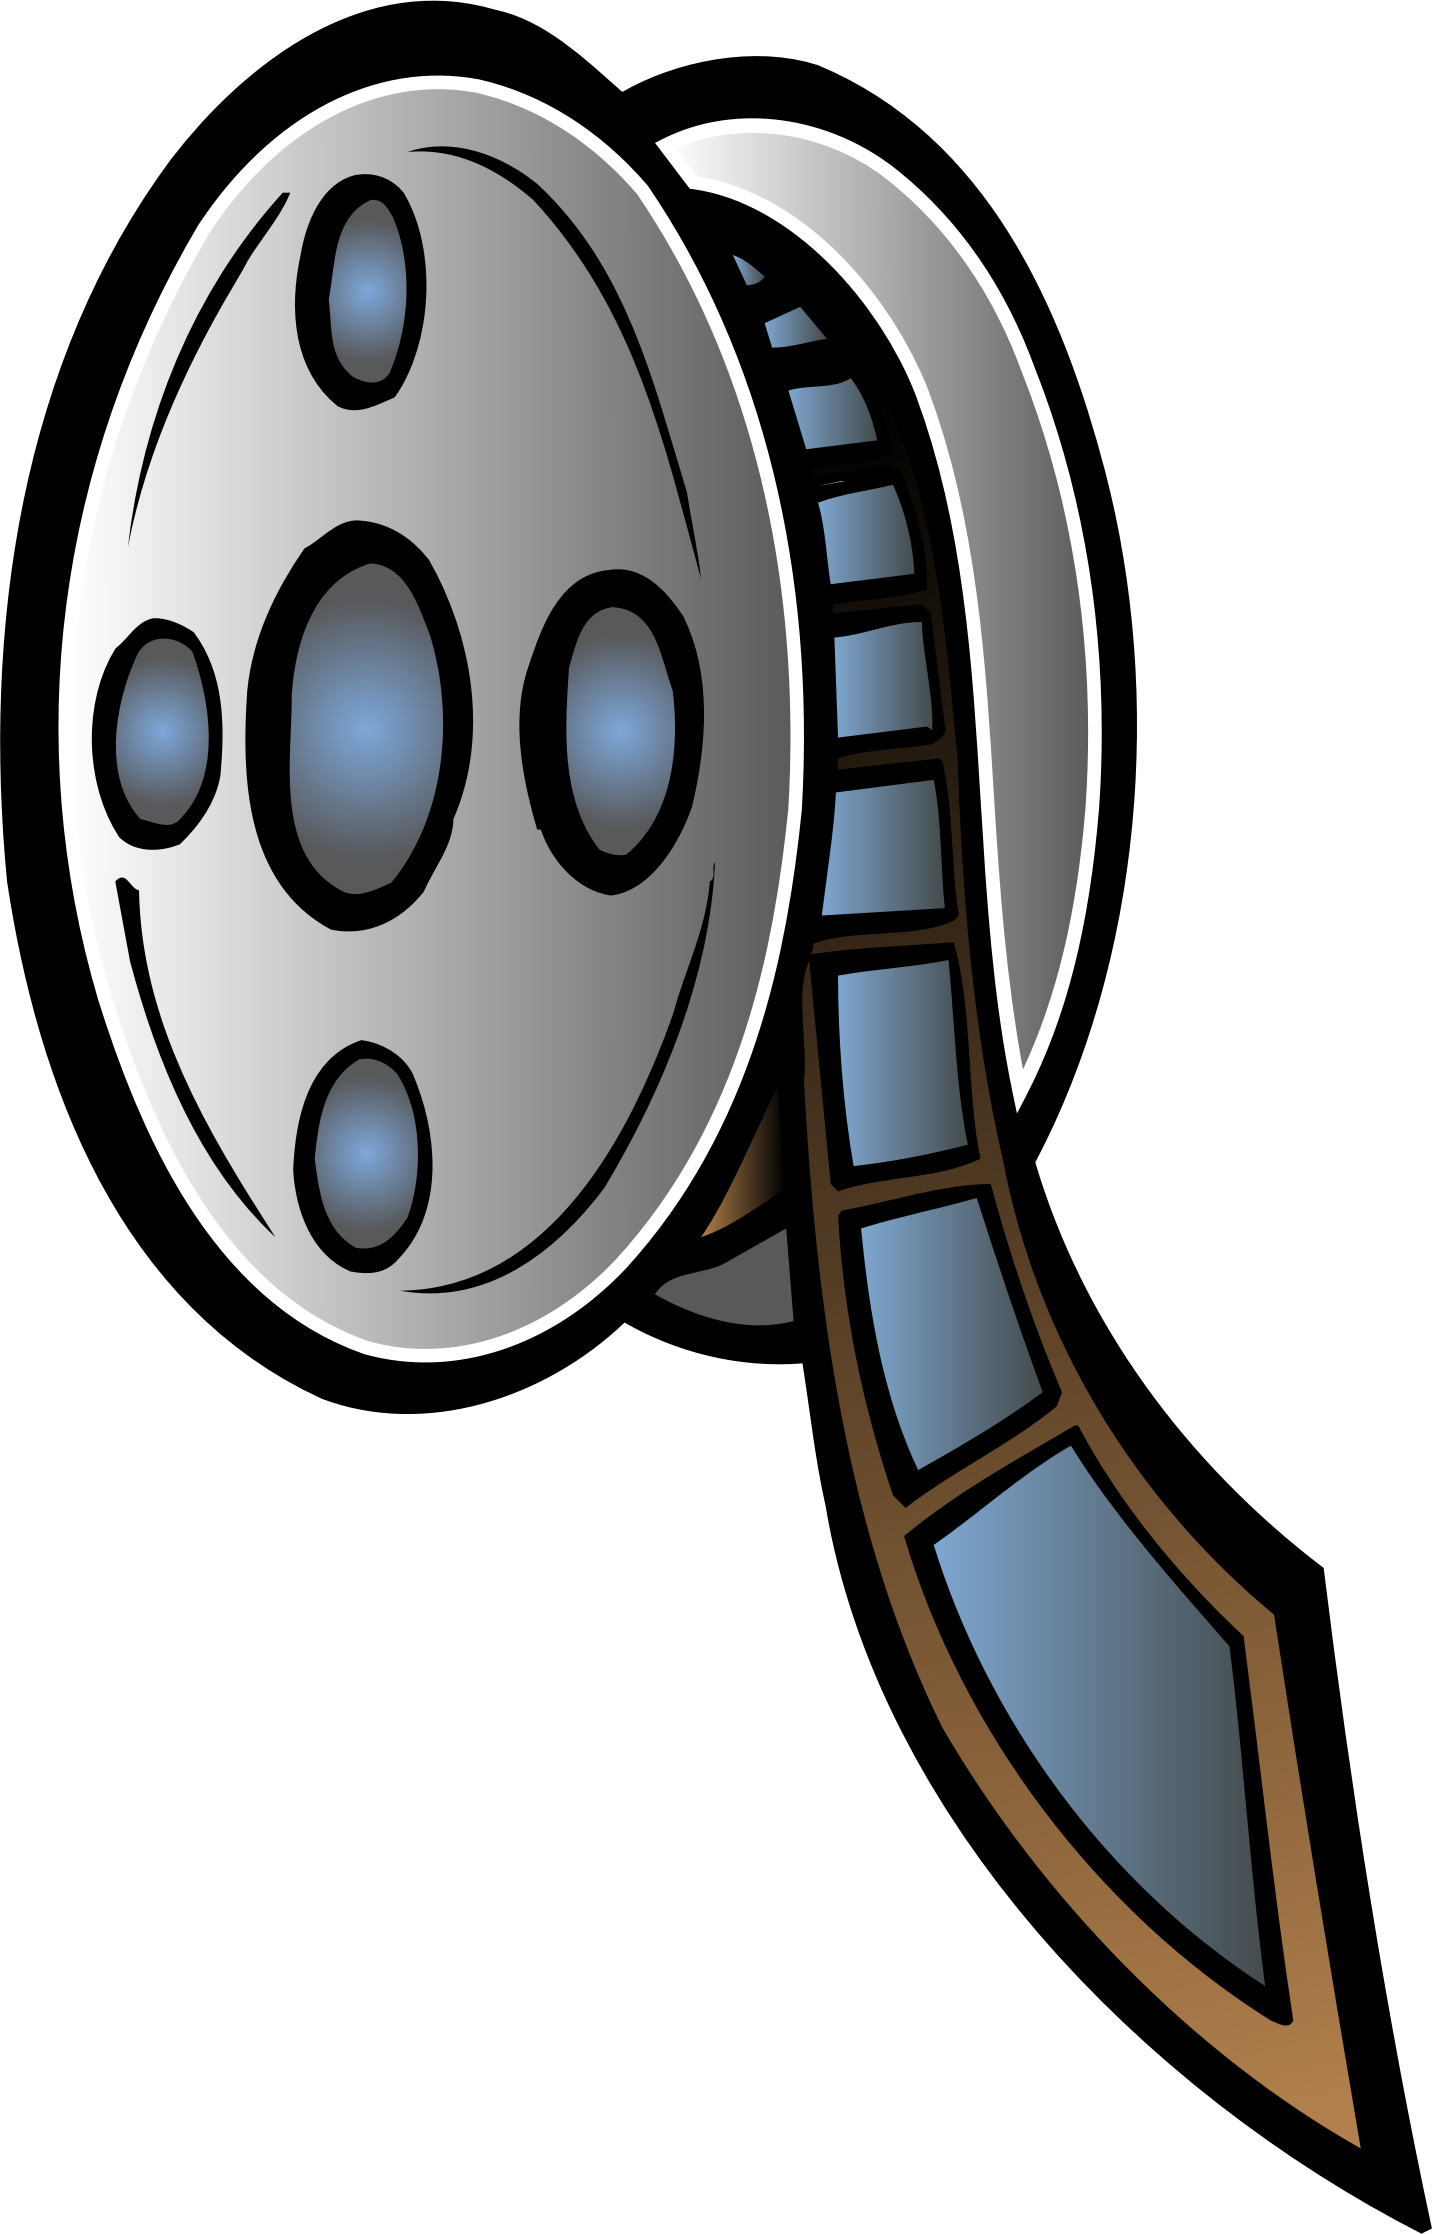 Movie reel clip art clipart.